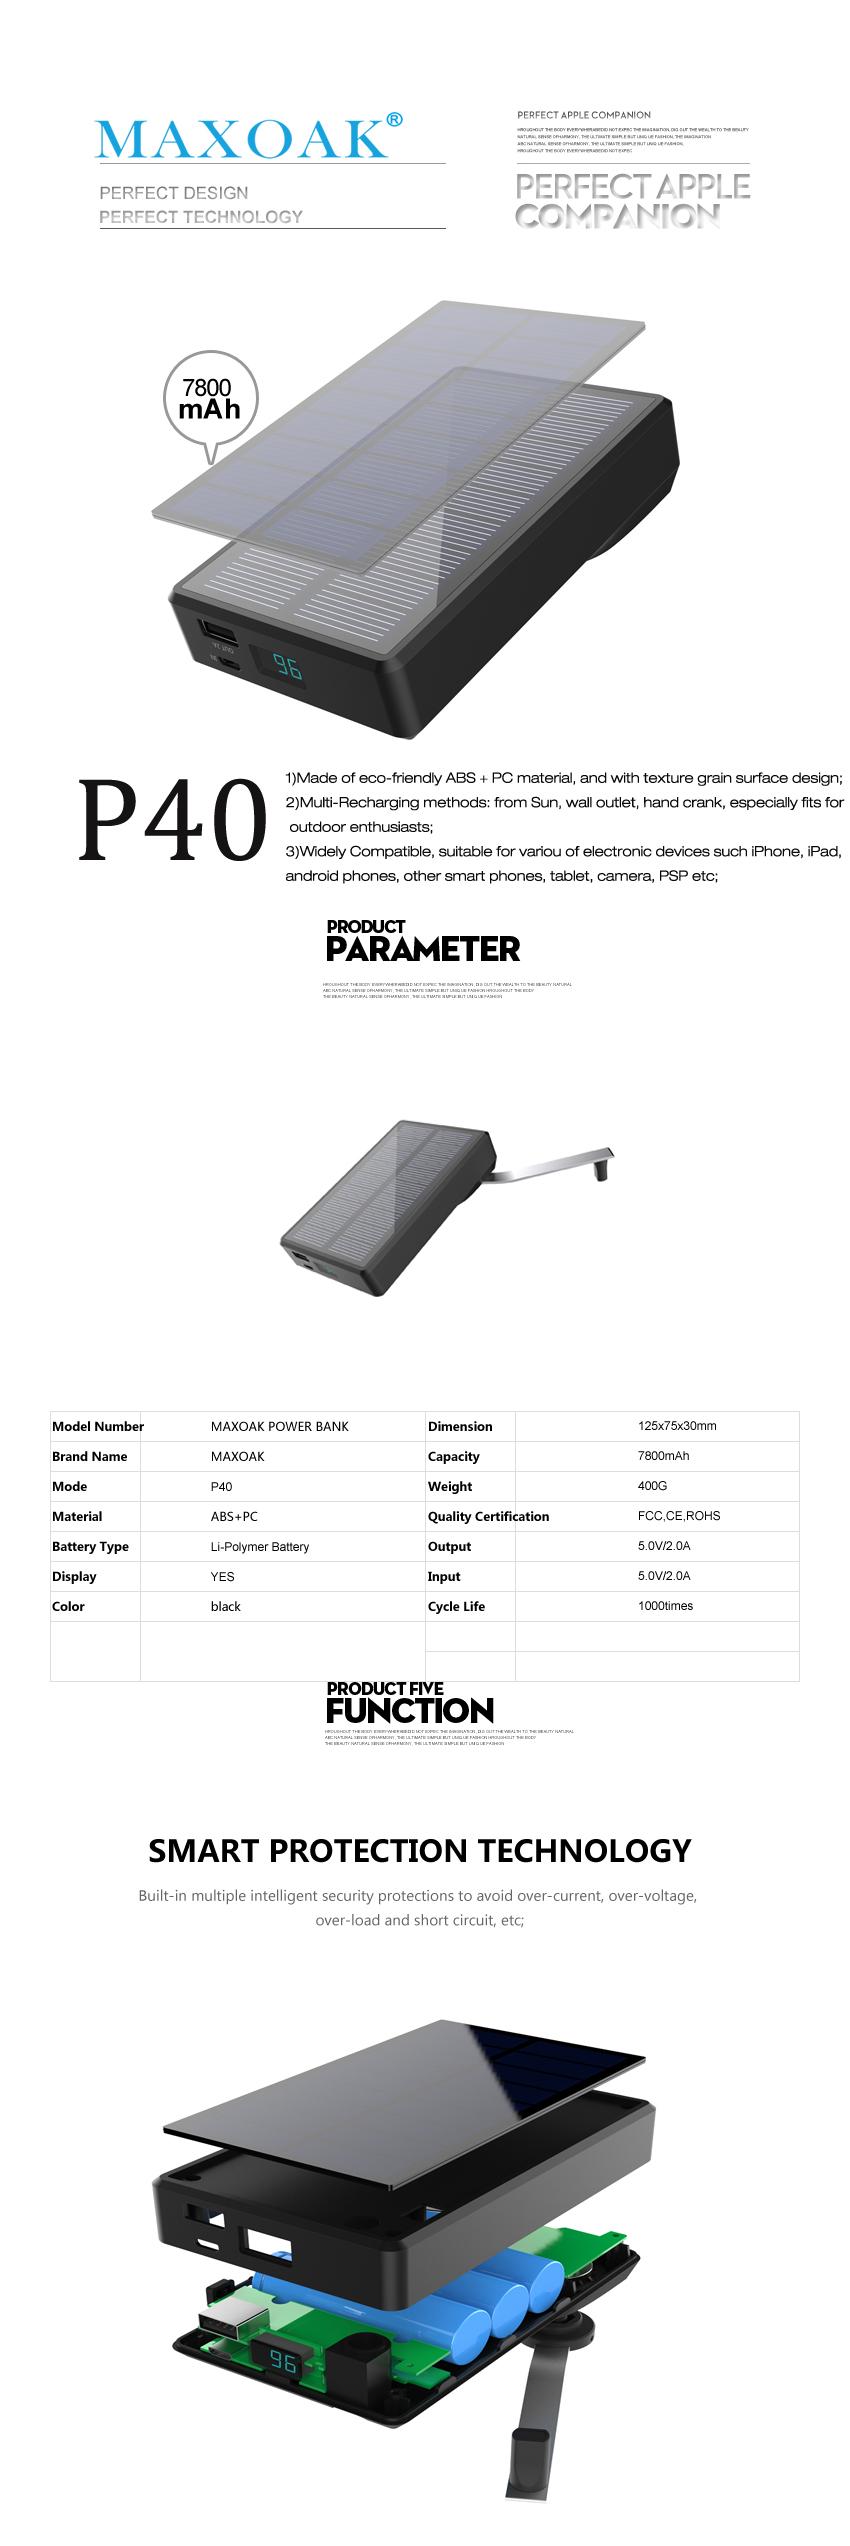 P40-Power bank-black-11